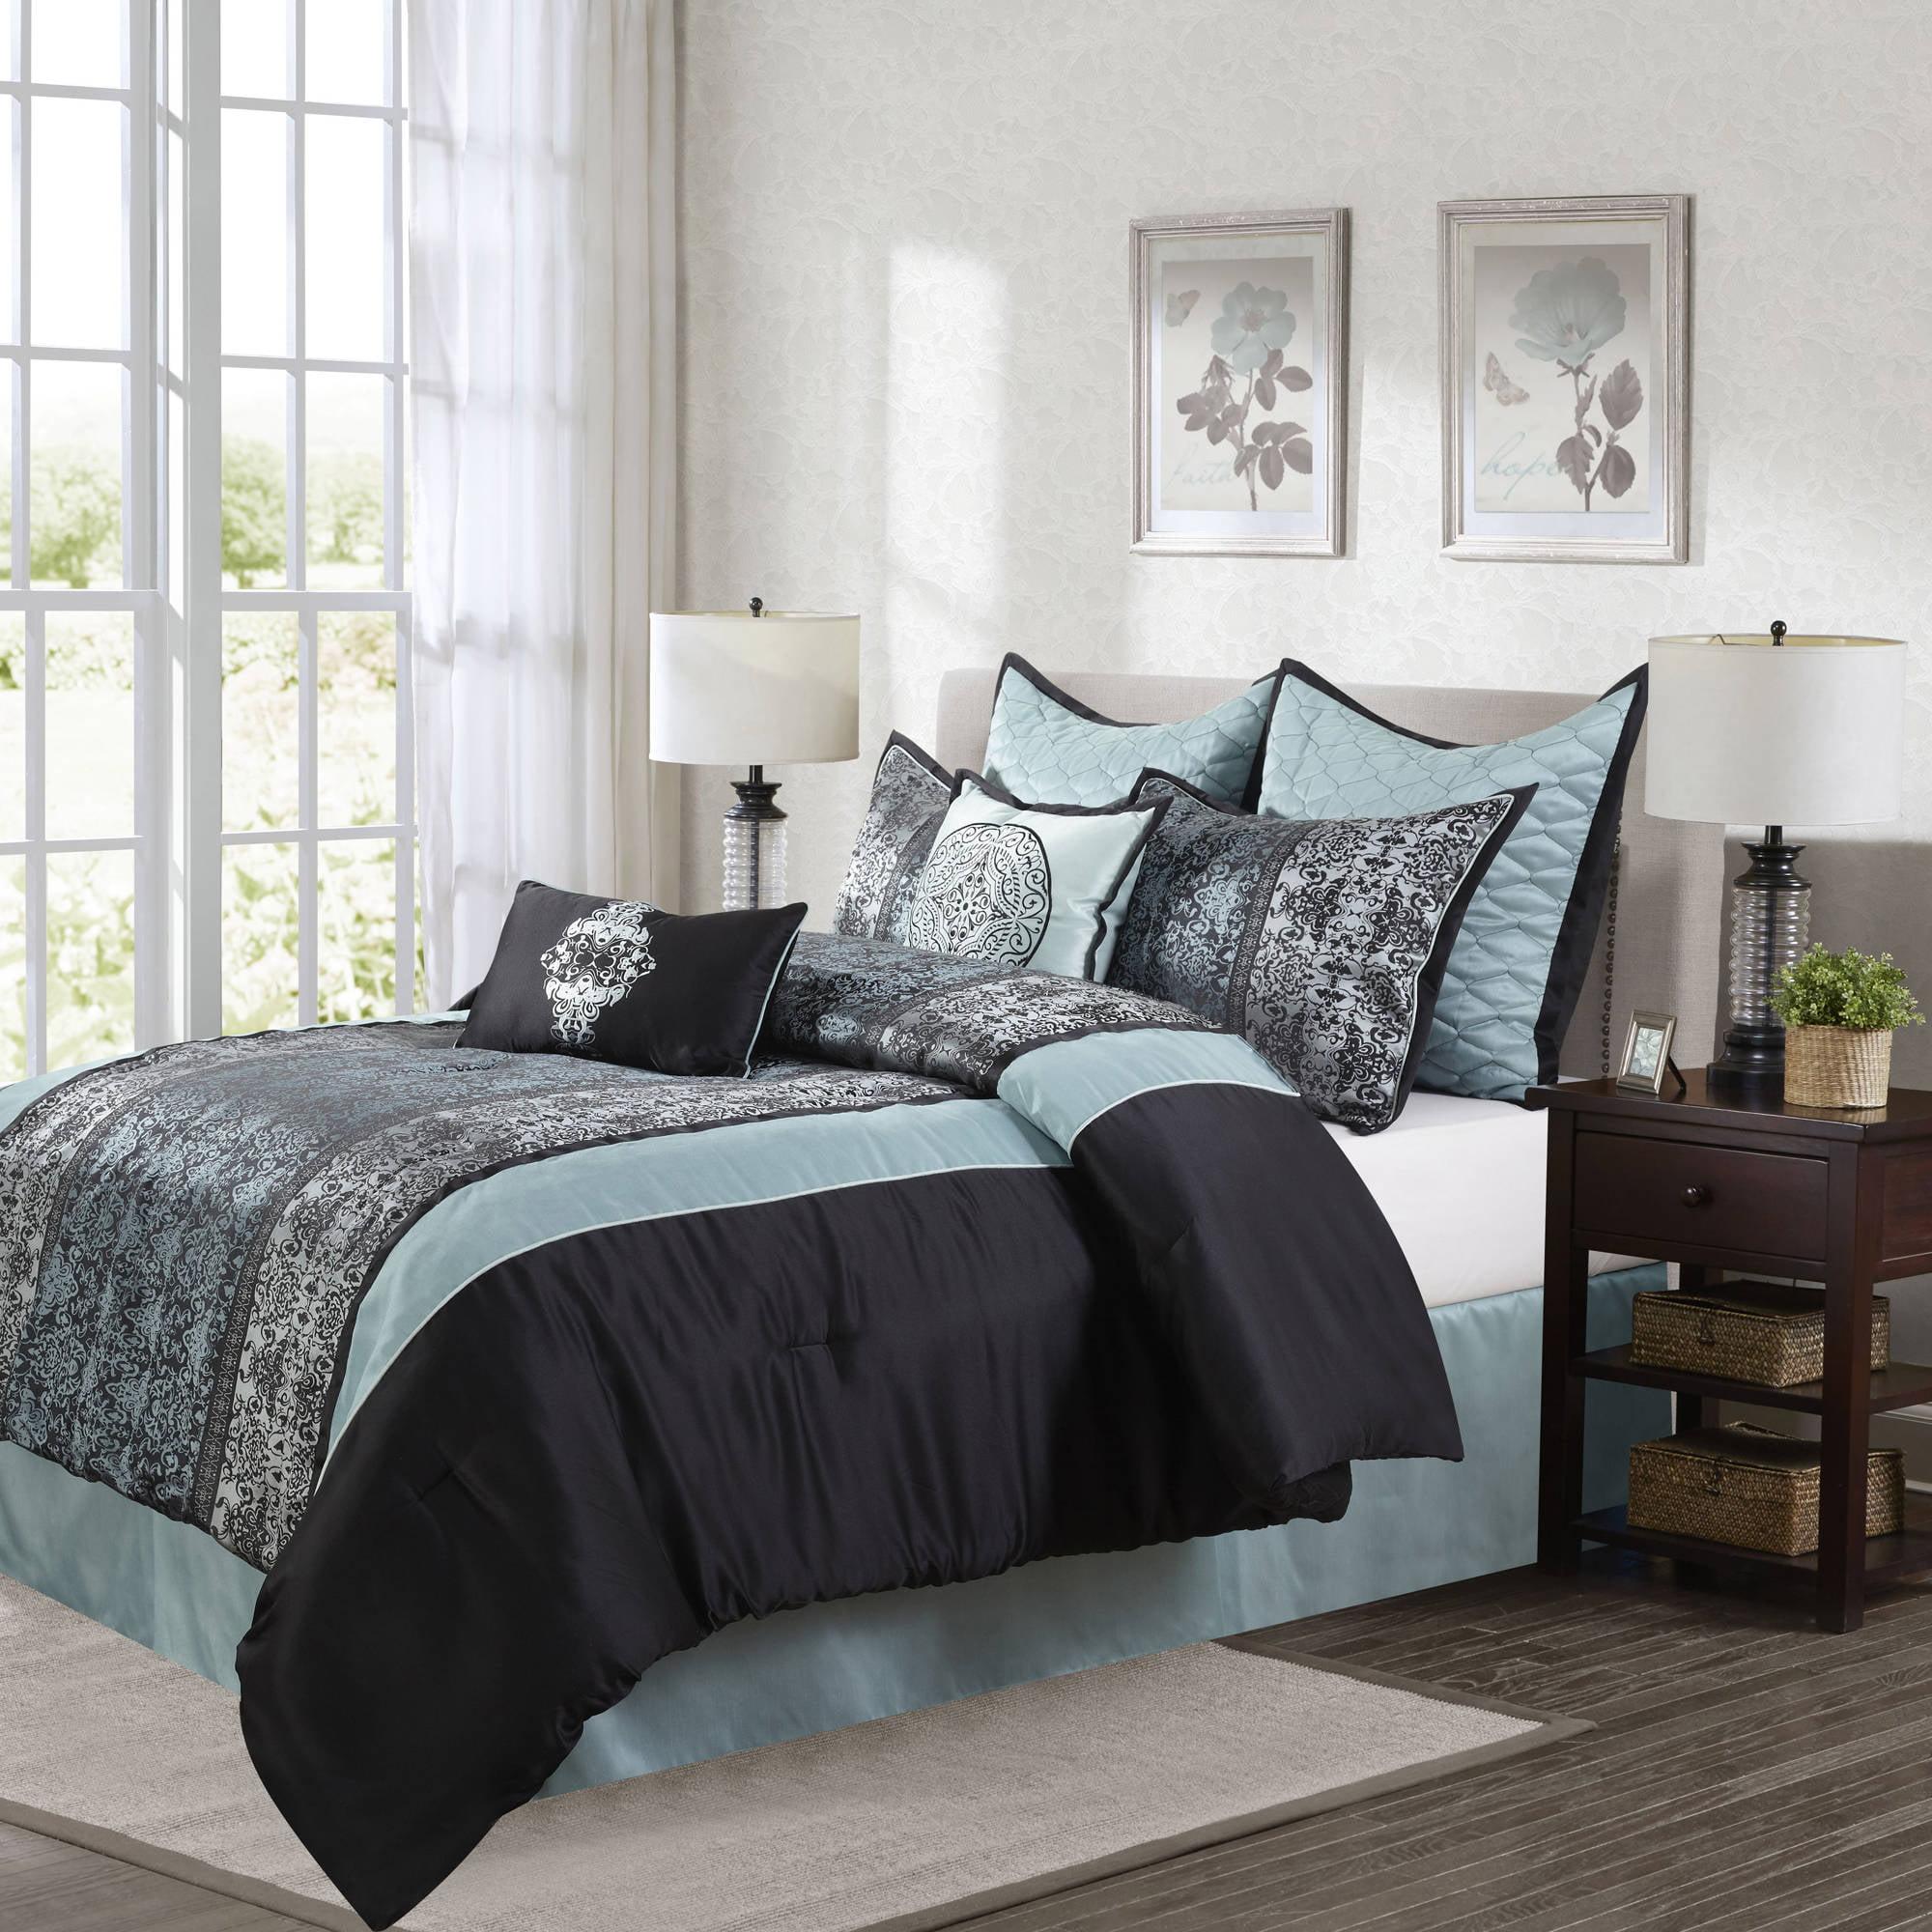 Wayfair basics wayfair basics 7 piece comforter set amp reviews - Stratford Park By Nanshing Arabesque 8 Piece Bedding Comforter Set